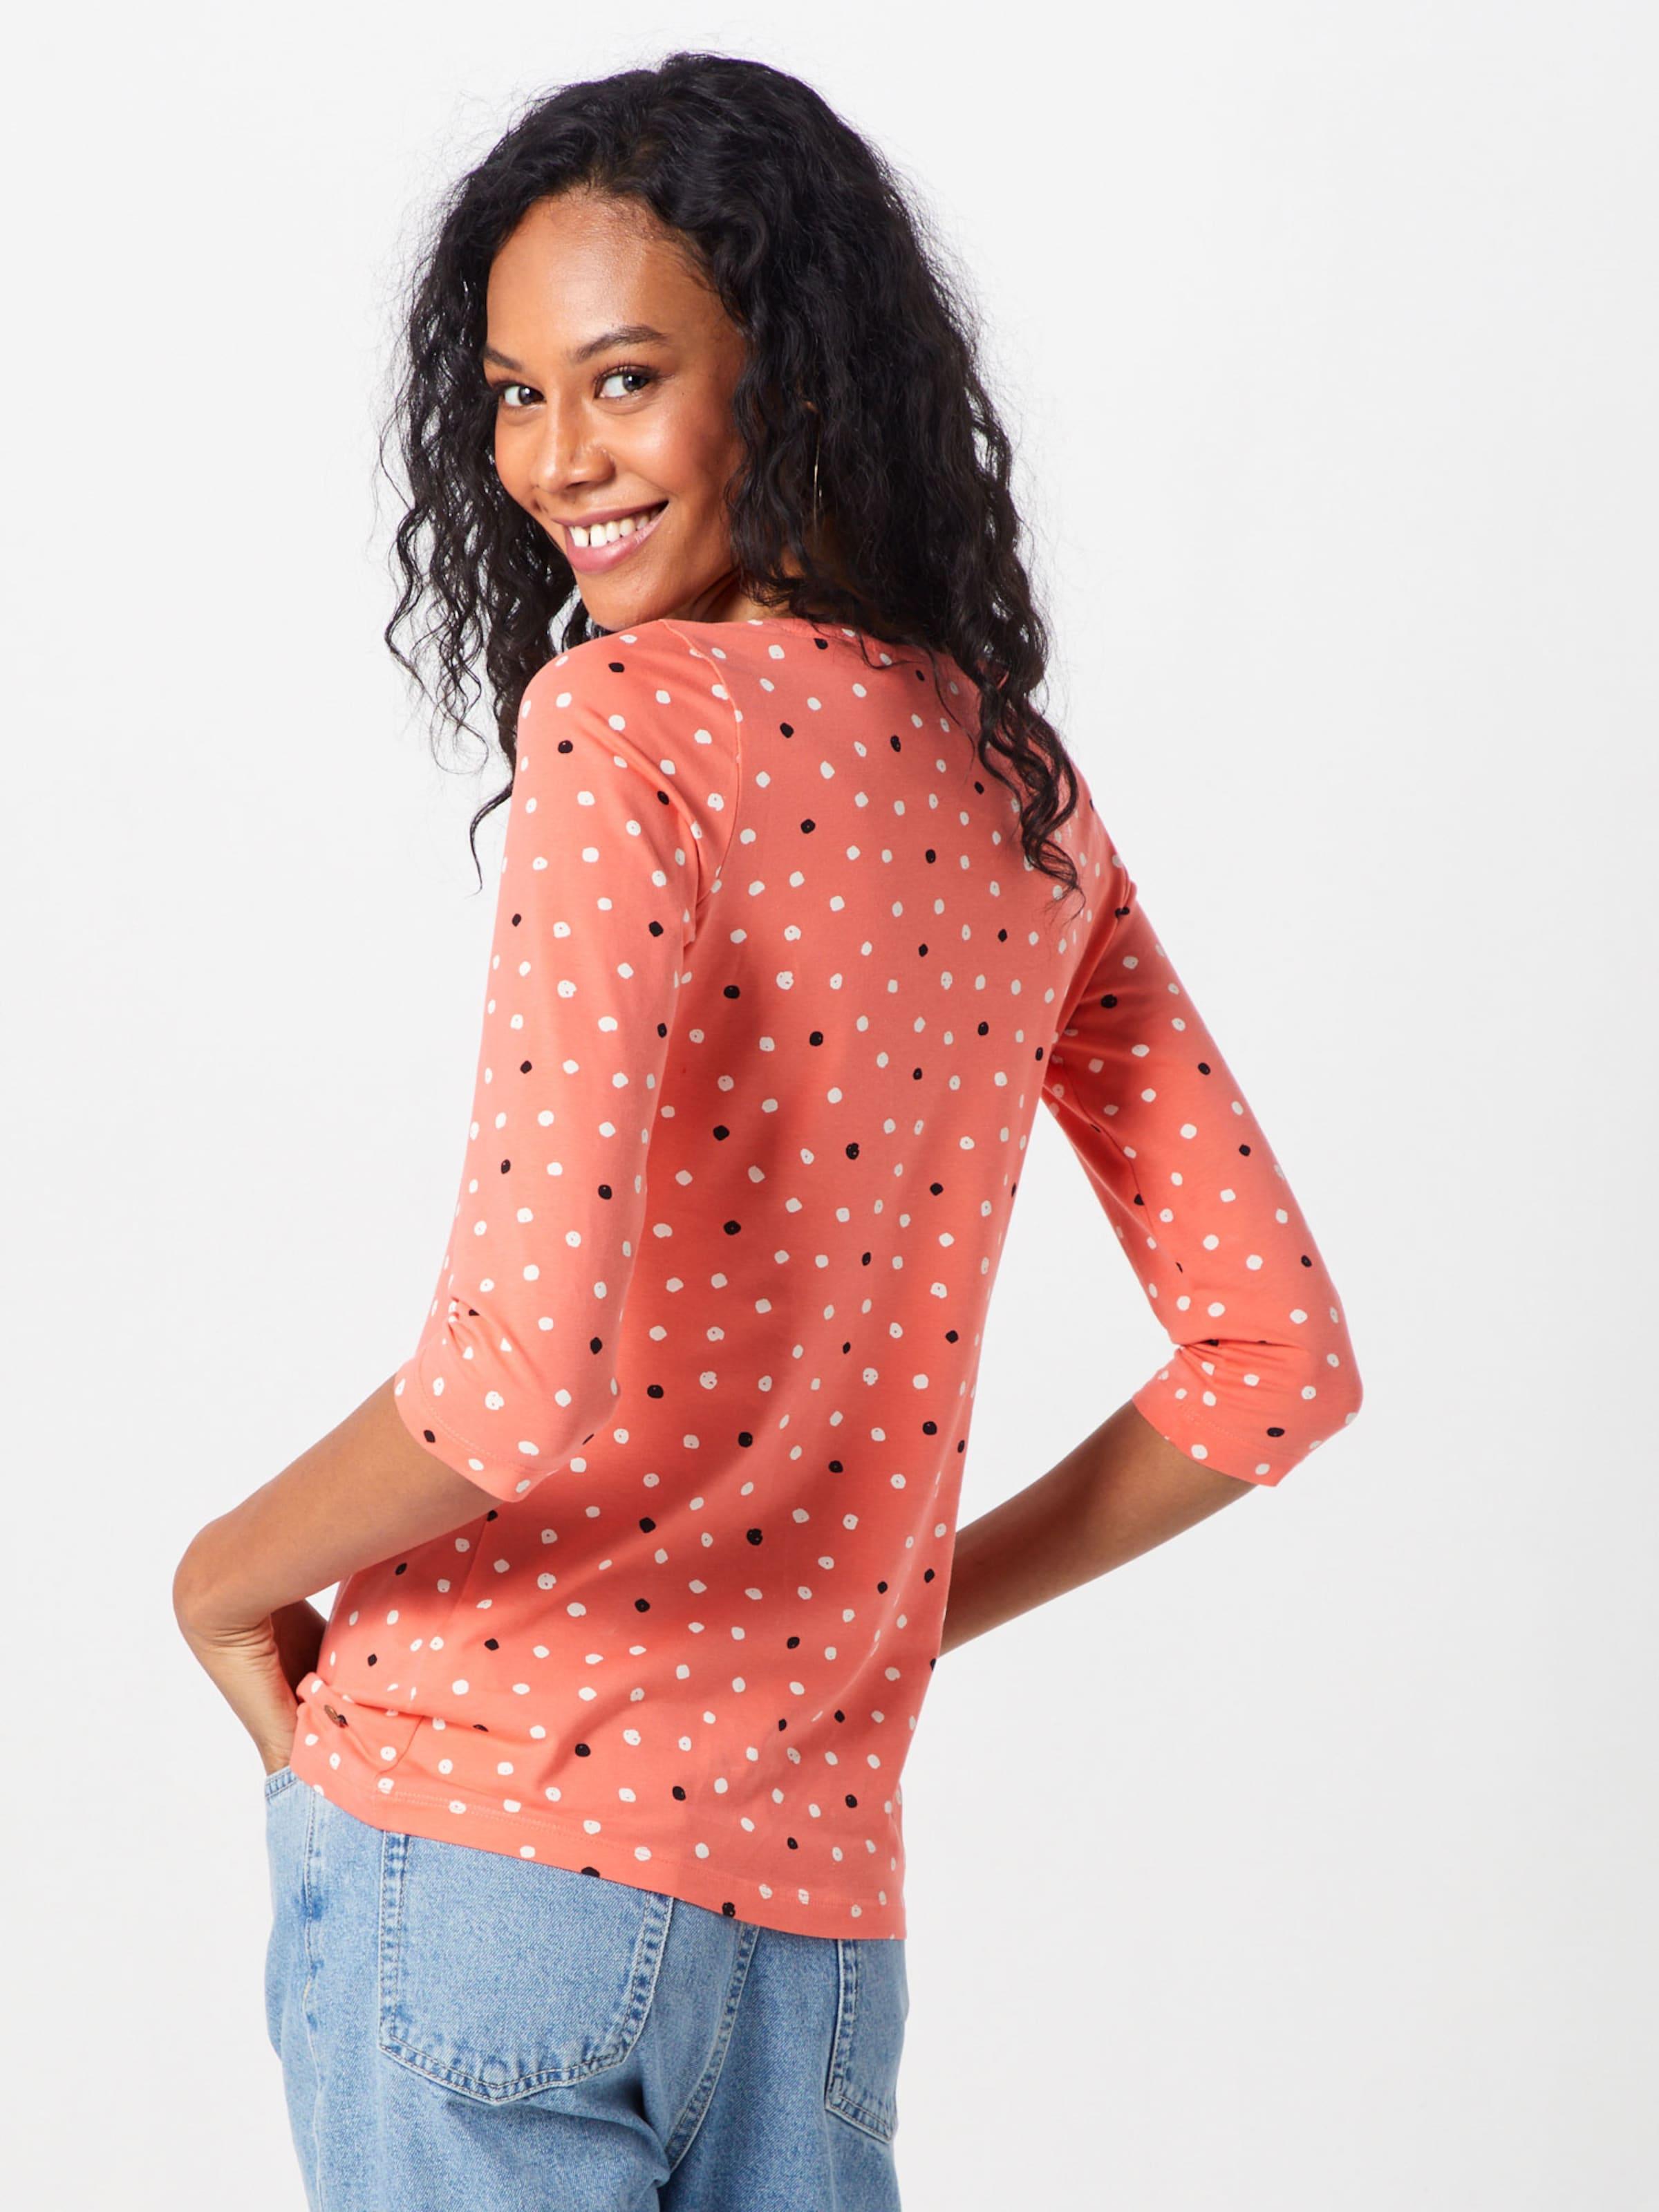 shirt Aop En Esprit T Tee 'eos Corail T shirts' PZuTXikO